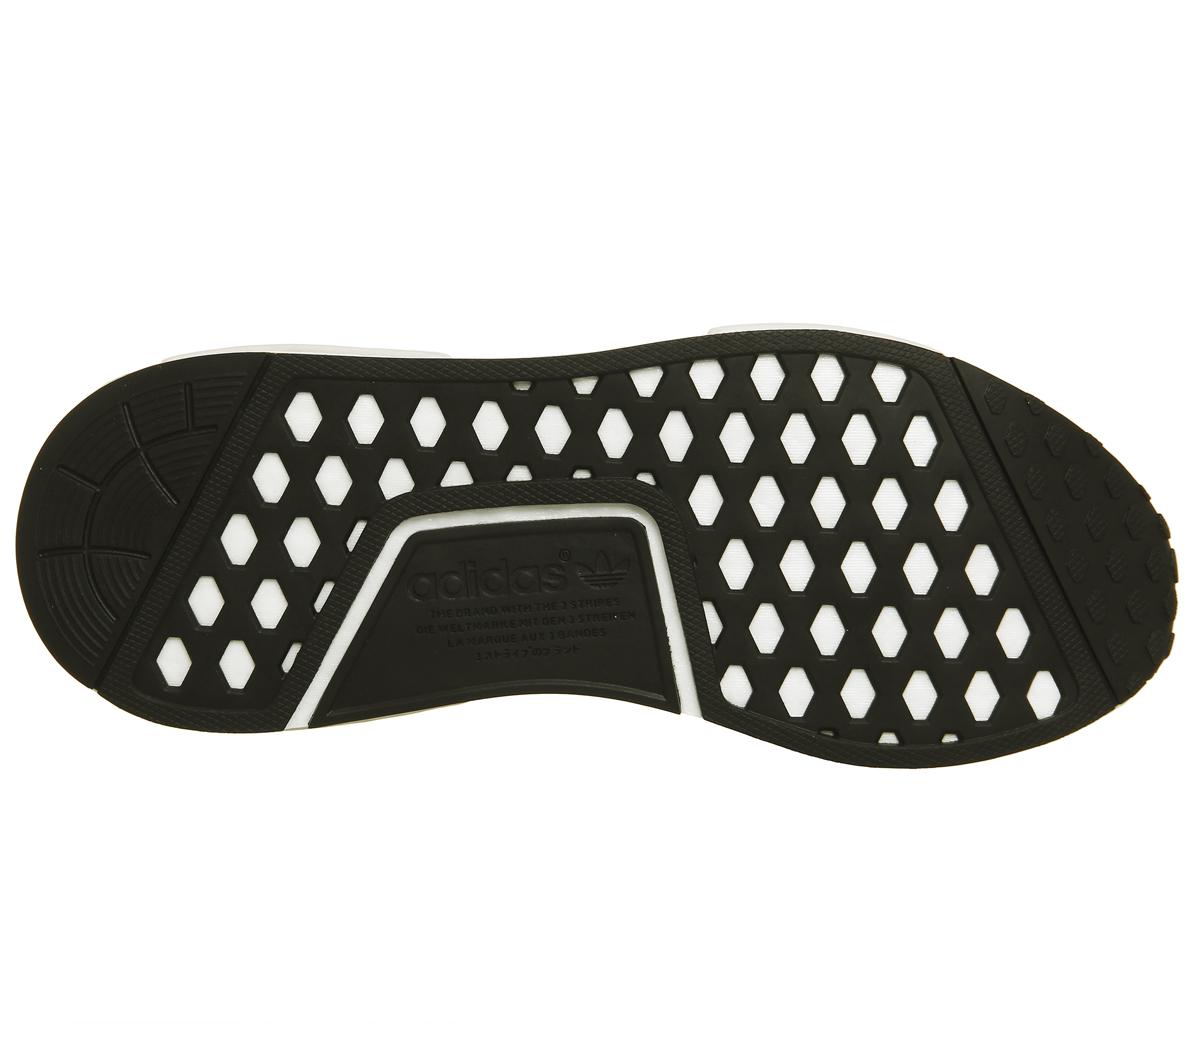 Adidas NMD Perle R1 Baskets sasema Craie Blanc Perle NMD Baskets Chaussures f7175f